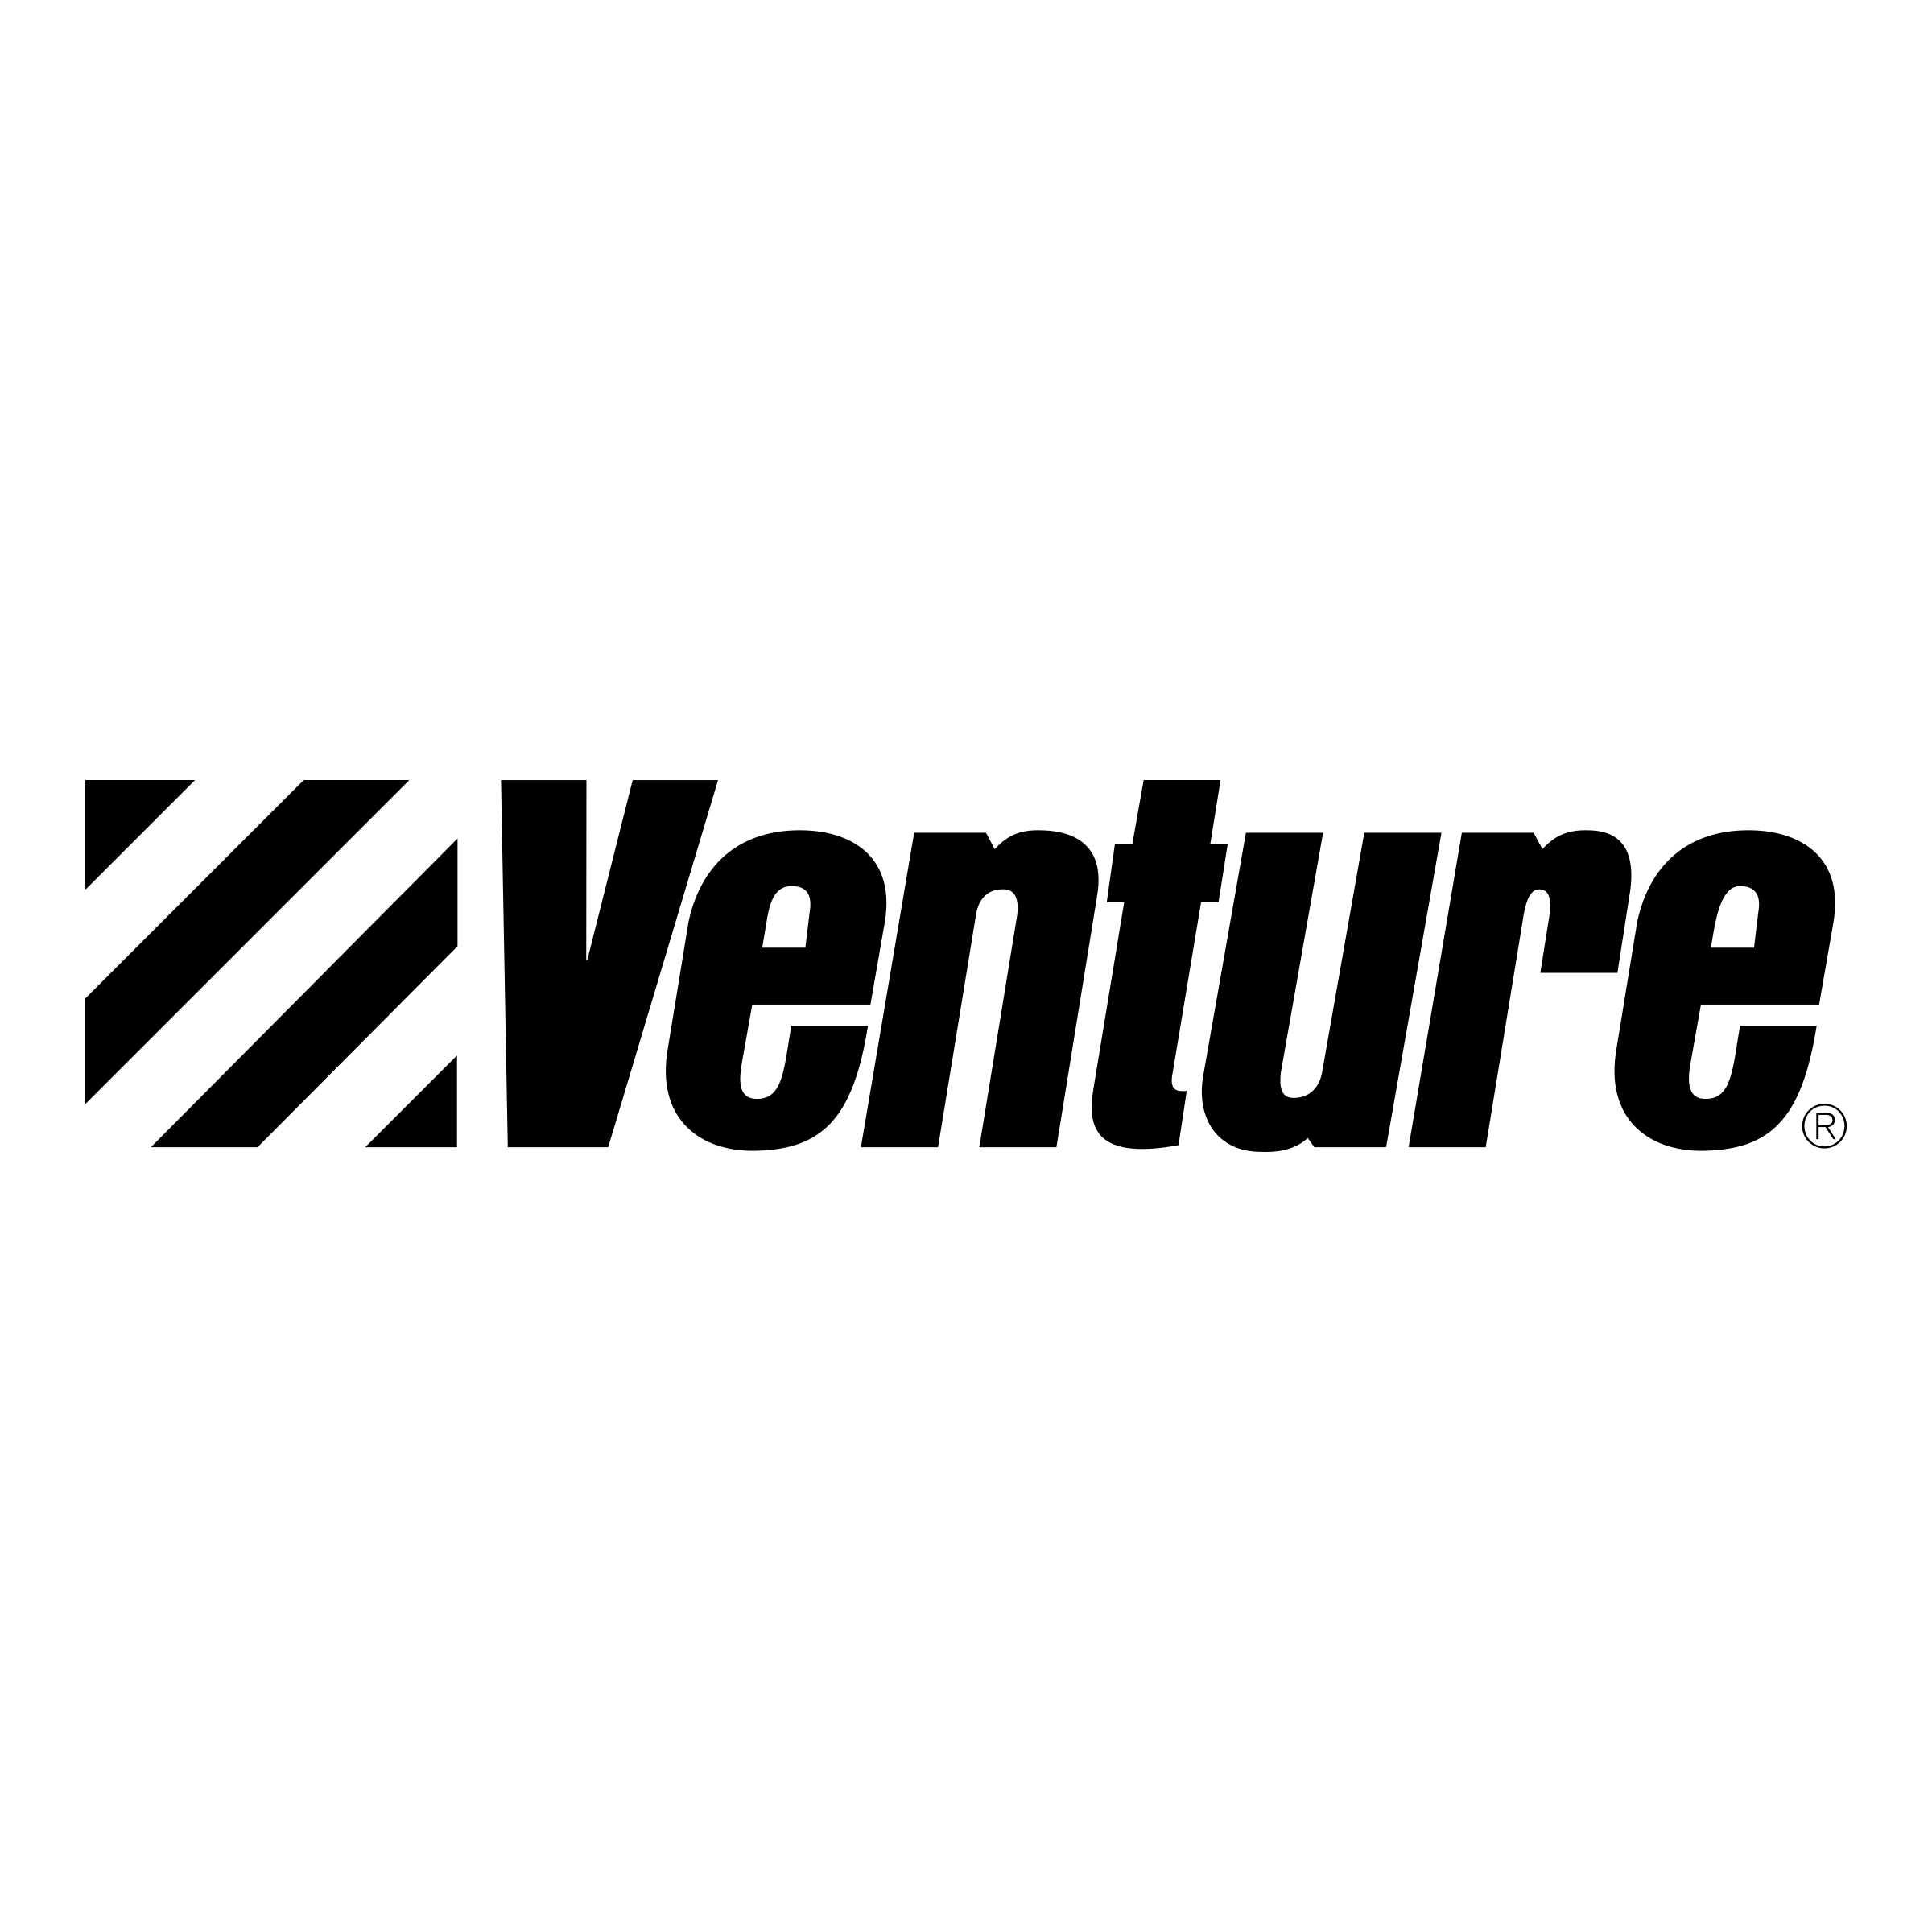 venture-1-logo-png-transparent